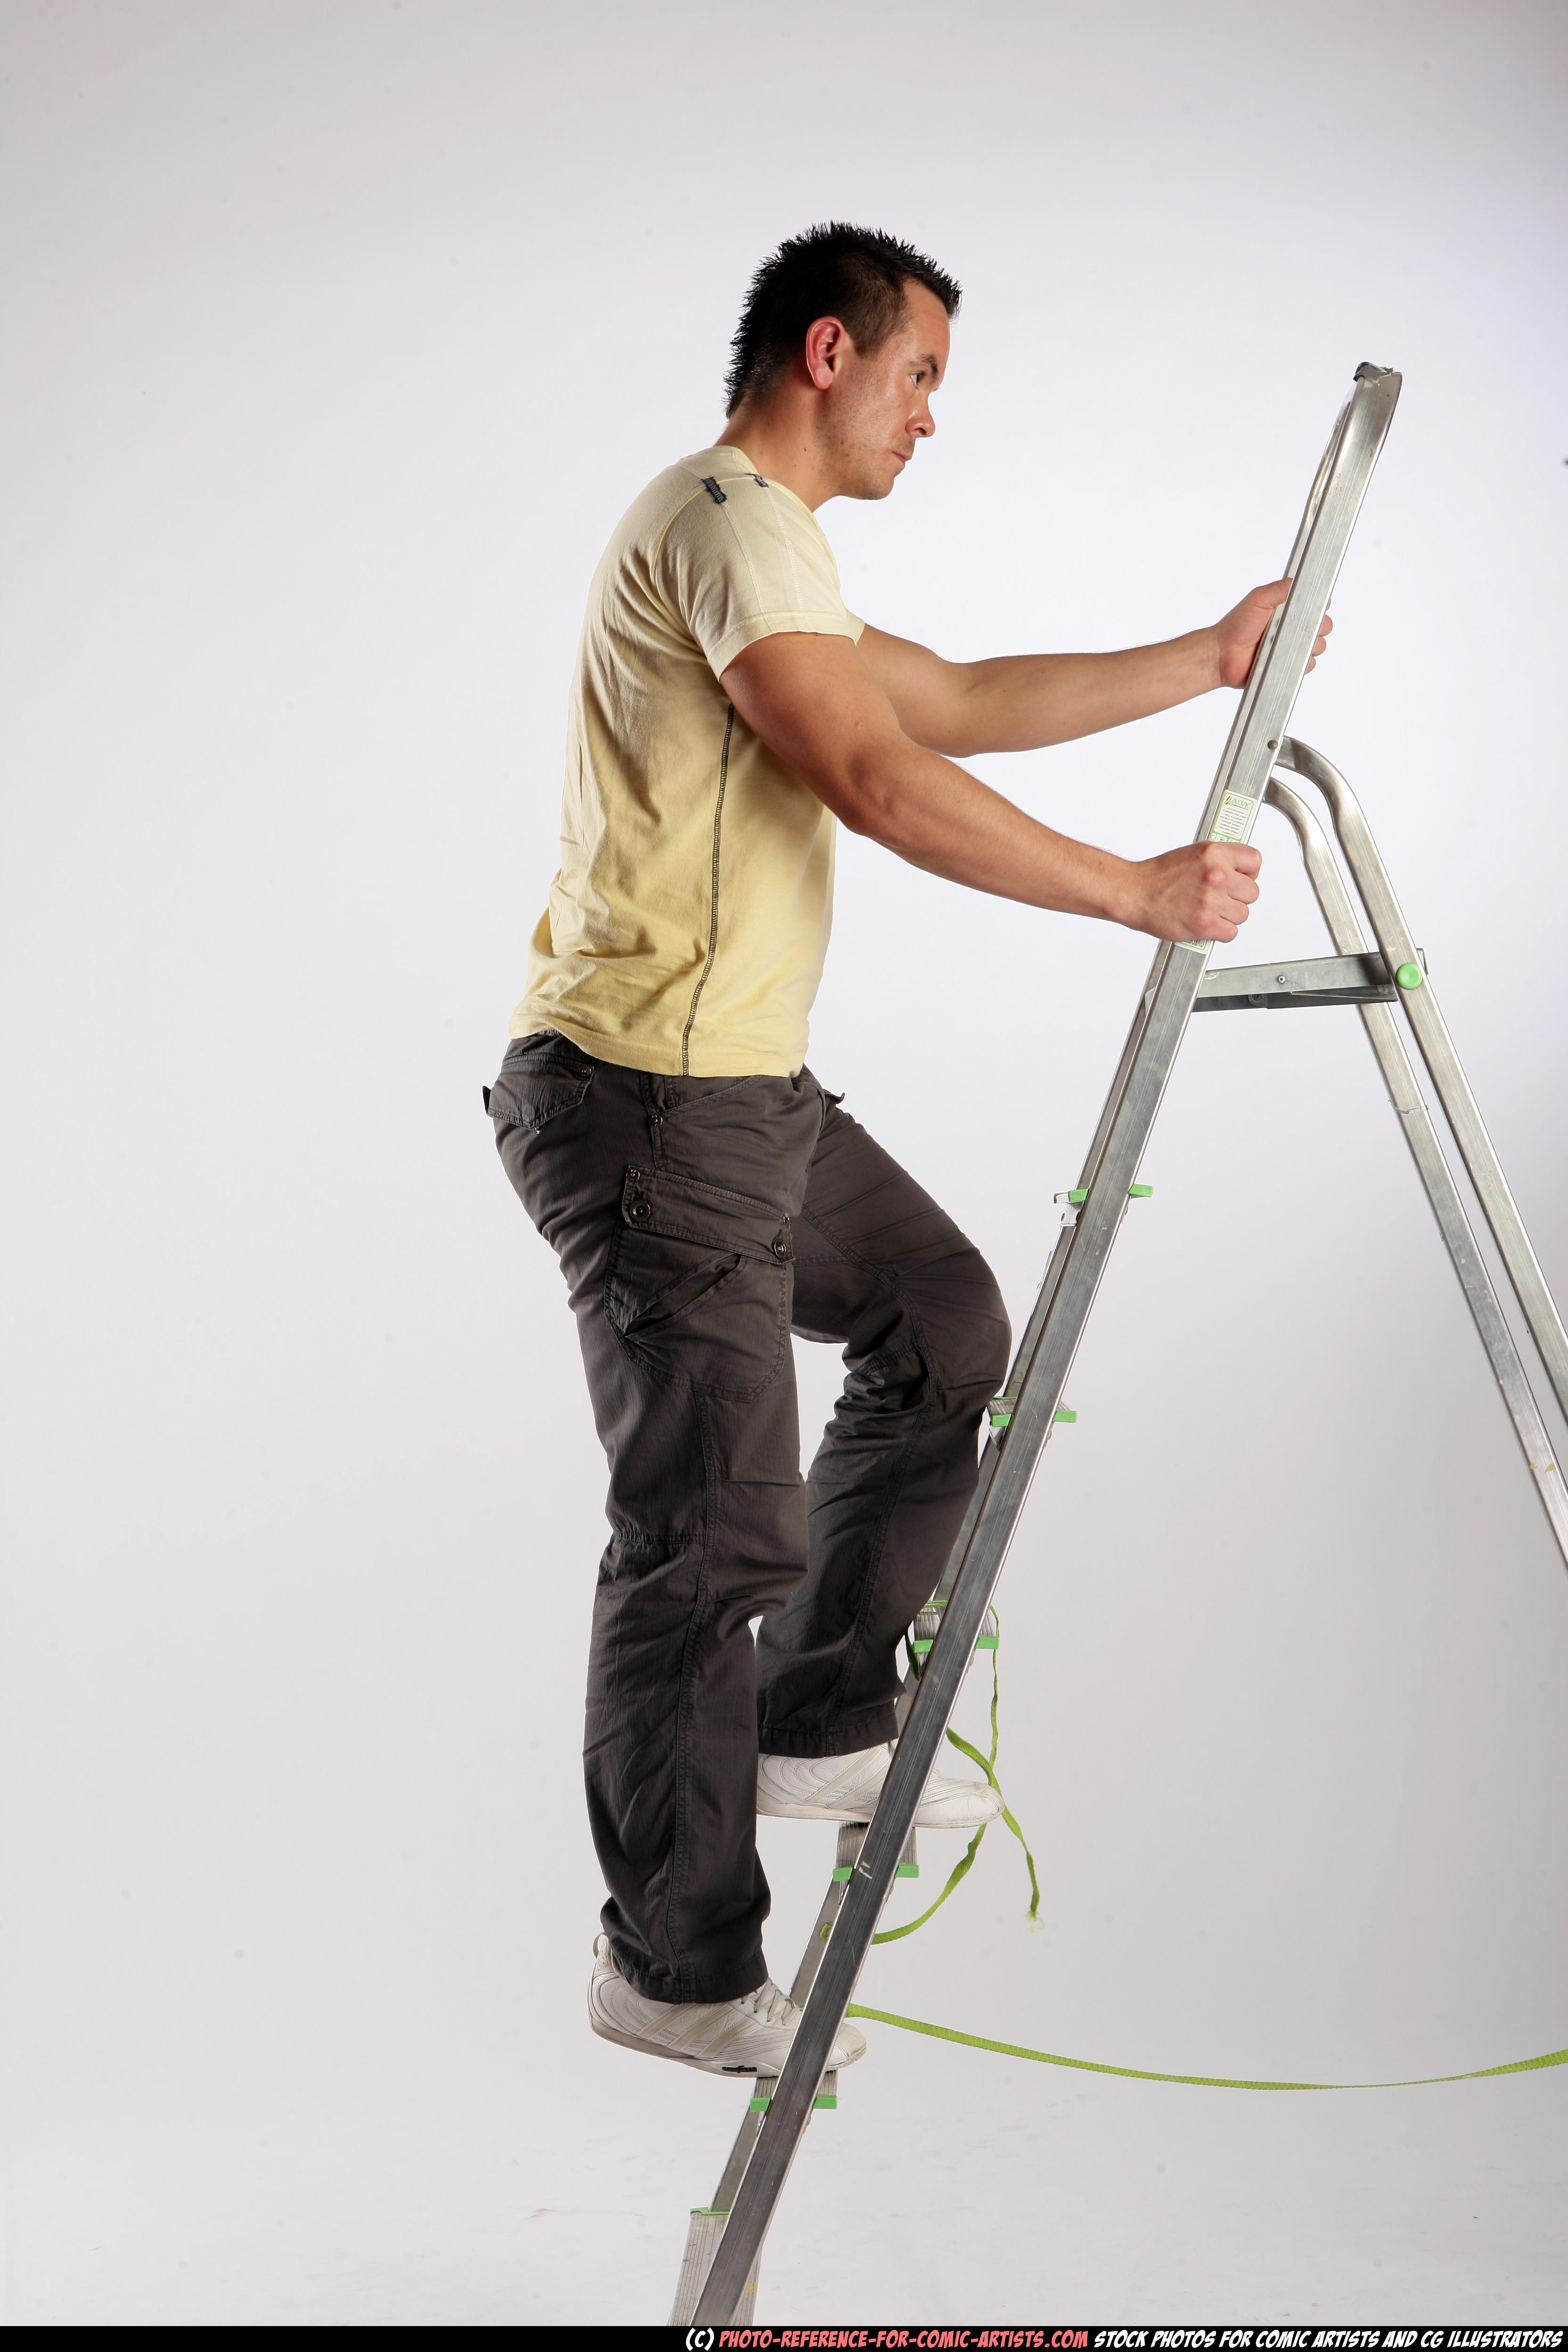 Johnny - using ladder